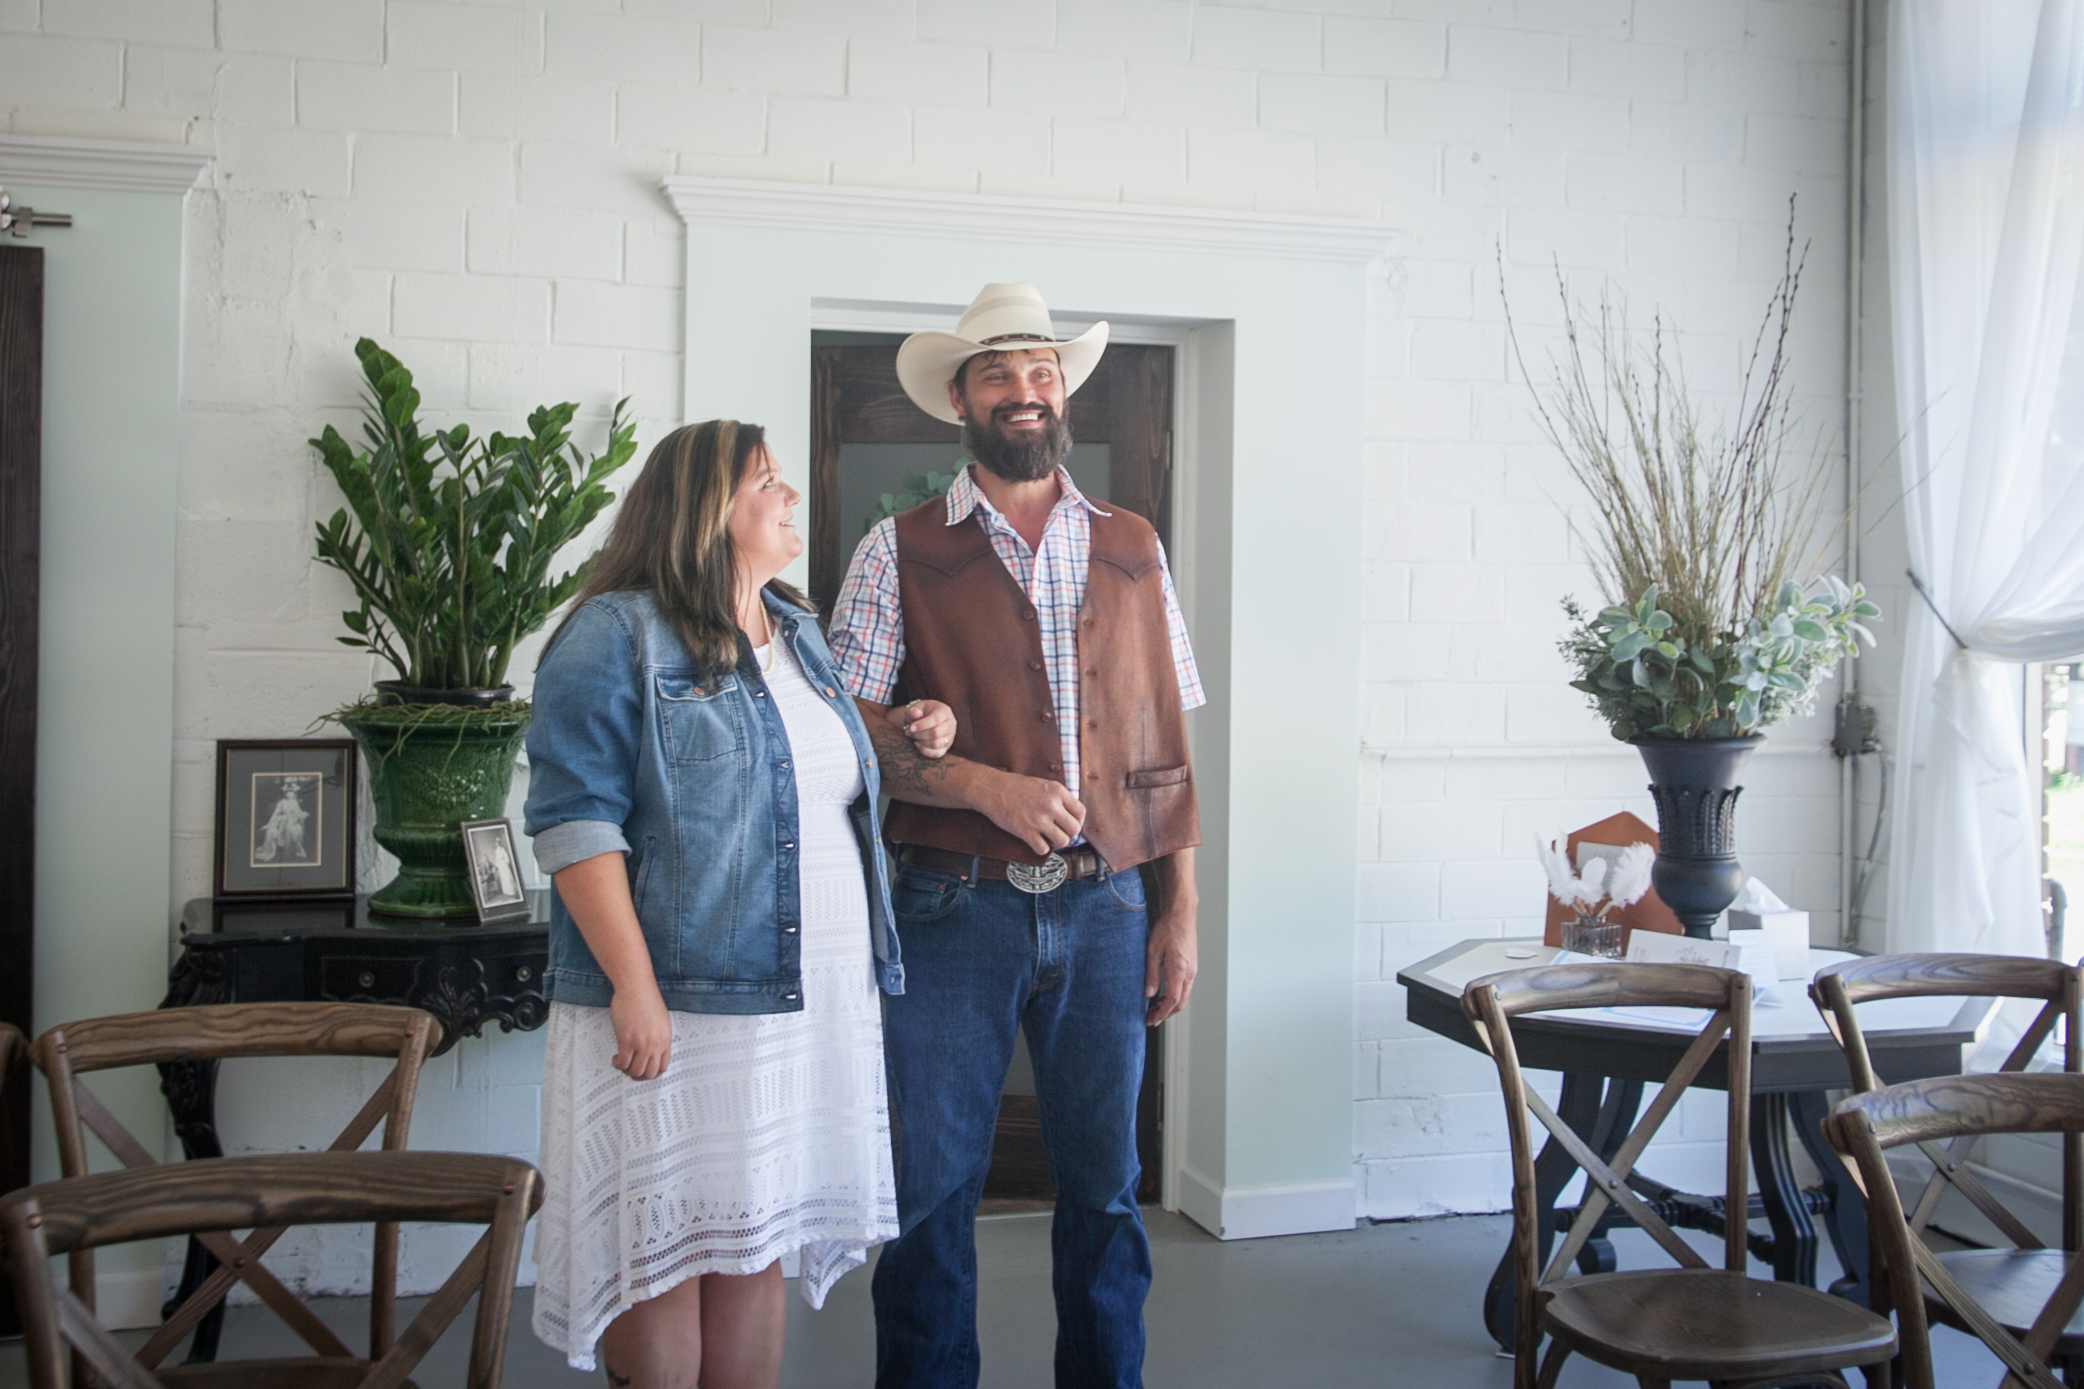 Kansas_City_Small_Wedding_Venue_Elope_Intimate_Ceremony_Budget_Affordable_Wedding Day-8.jpg